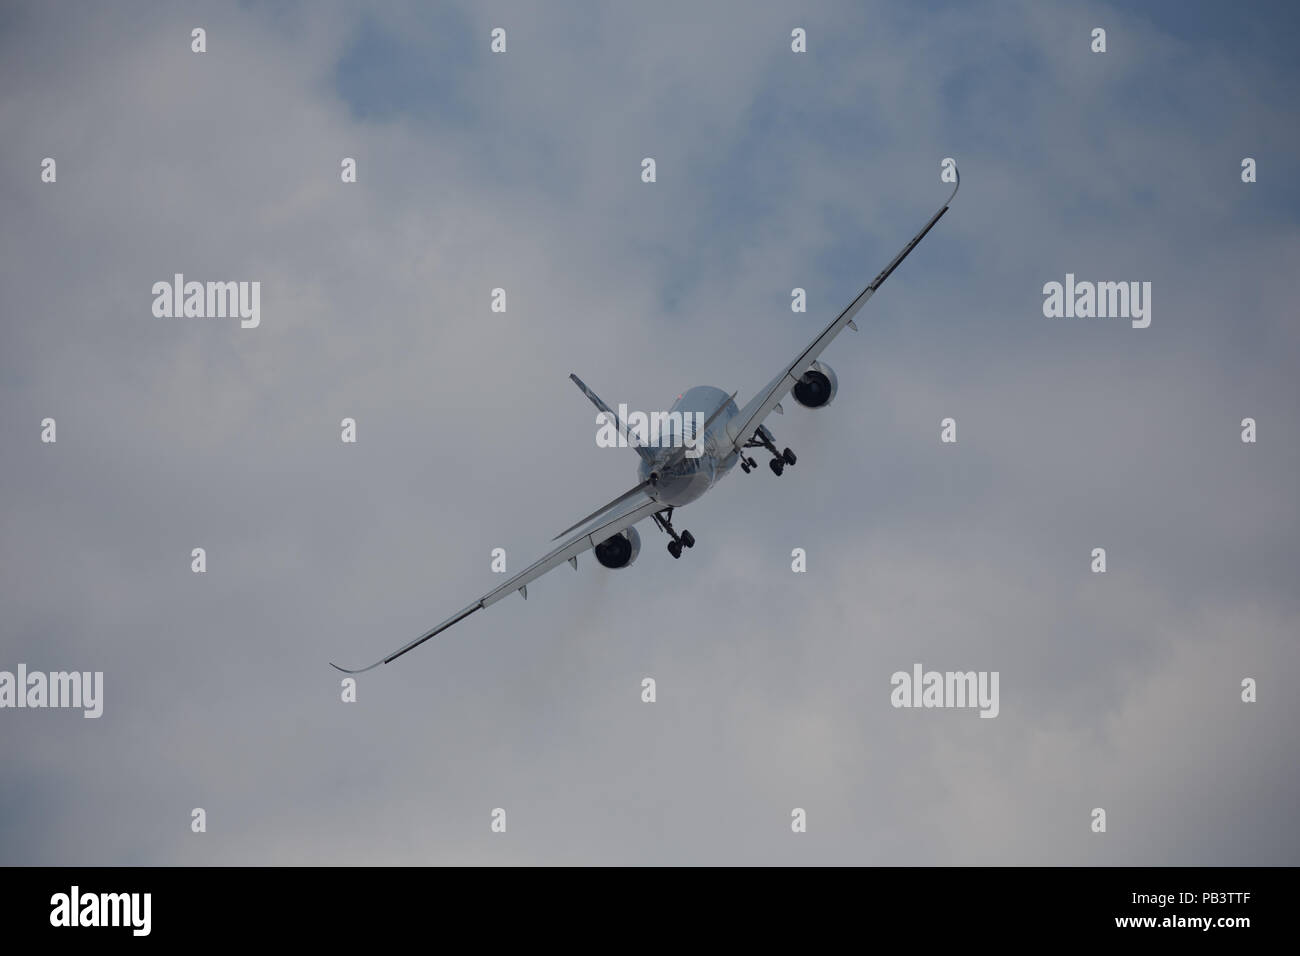 farnborough airshow 2018 - Stock Image